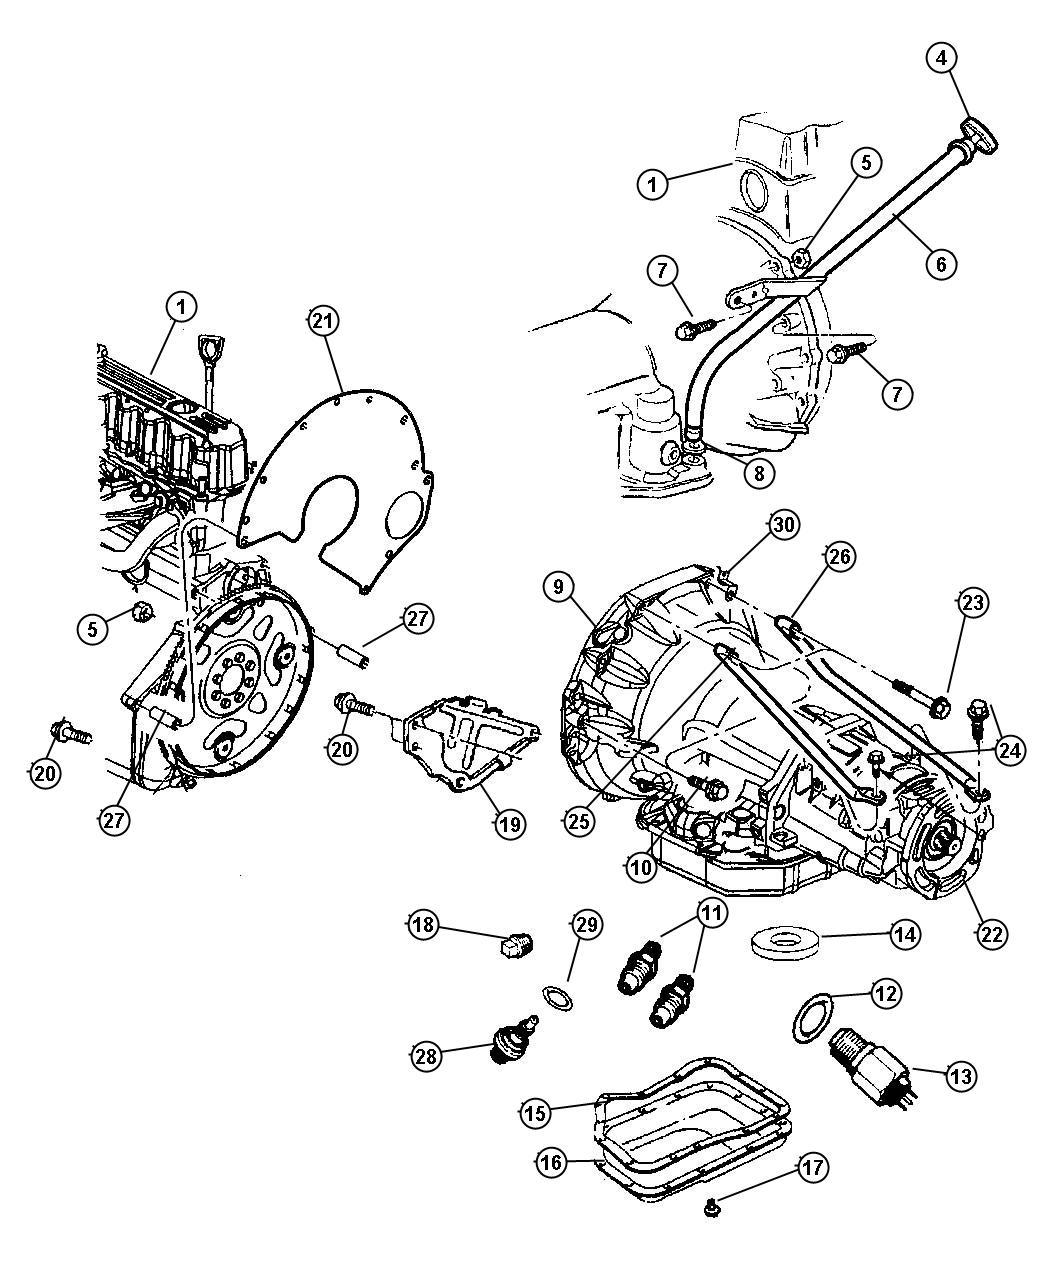 1995 Jeep Grand Cherokee Sensor. Transmission output speed